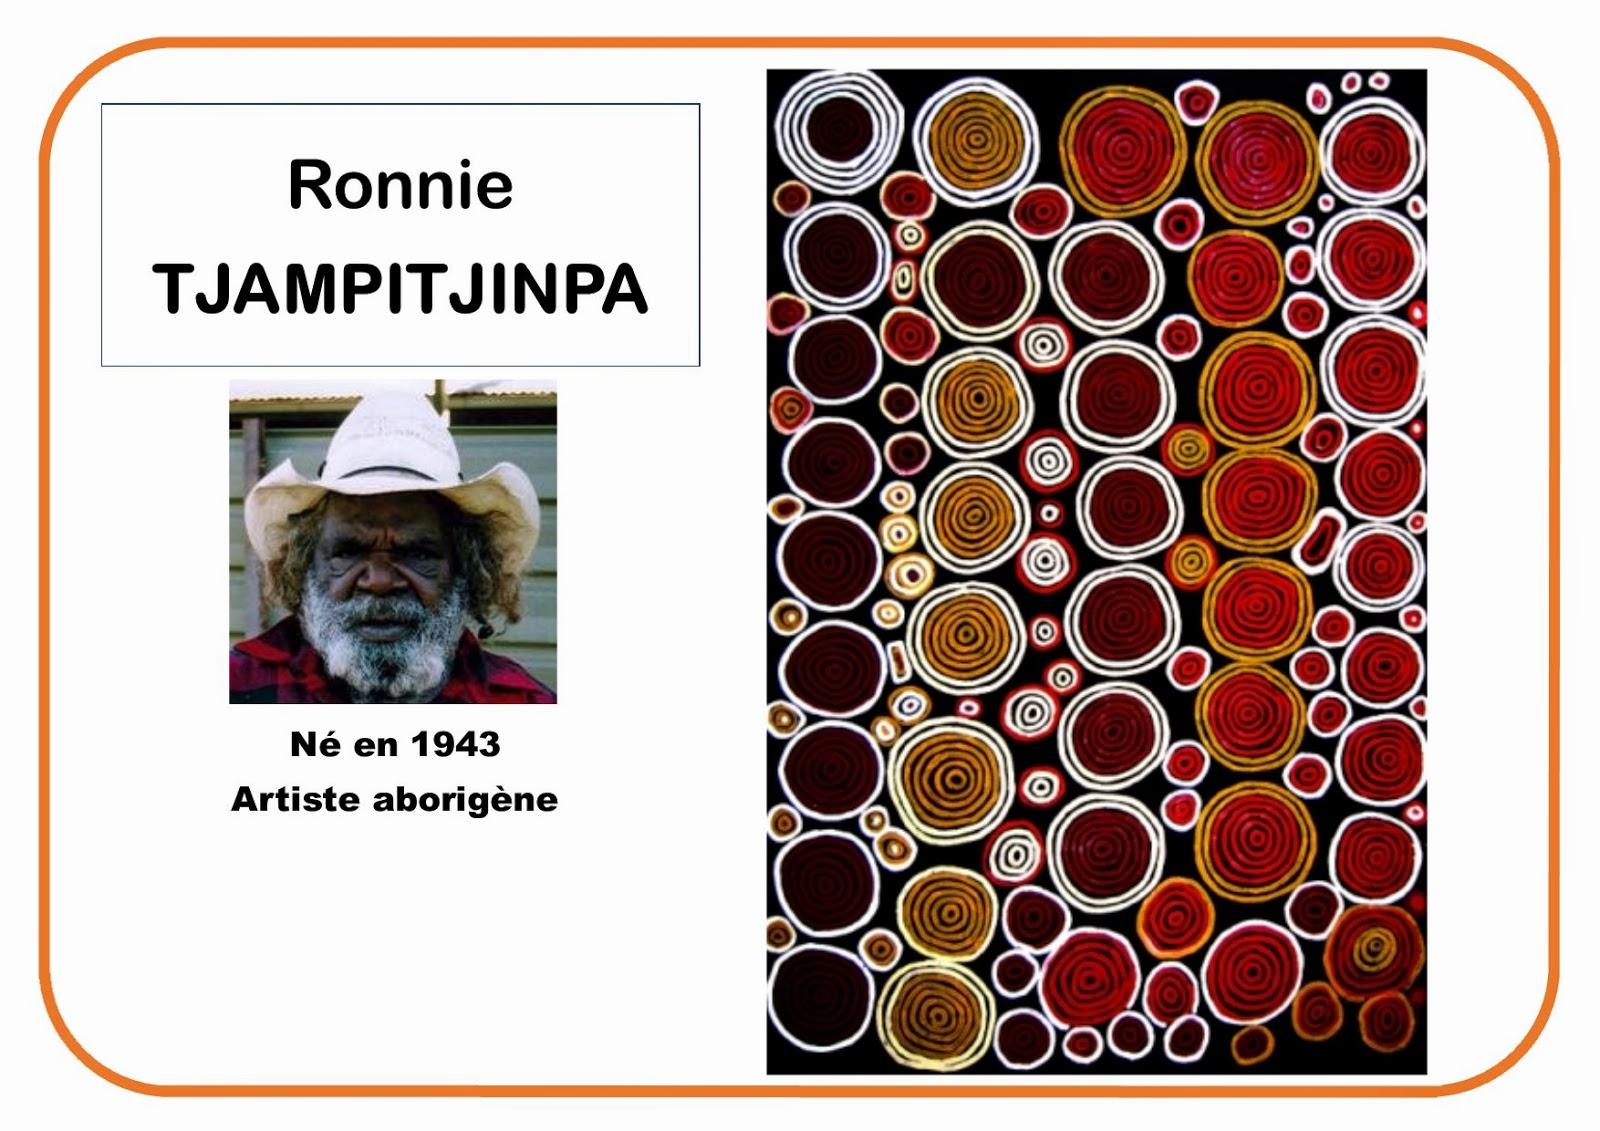 Ronnie Tjampitjinpa - Portrait d'artiste